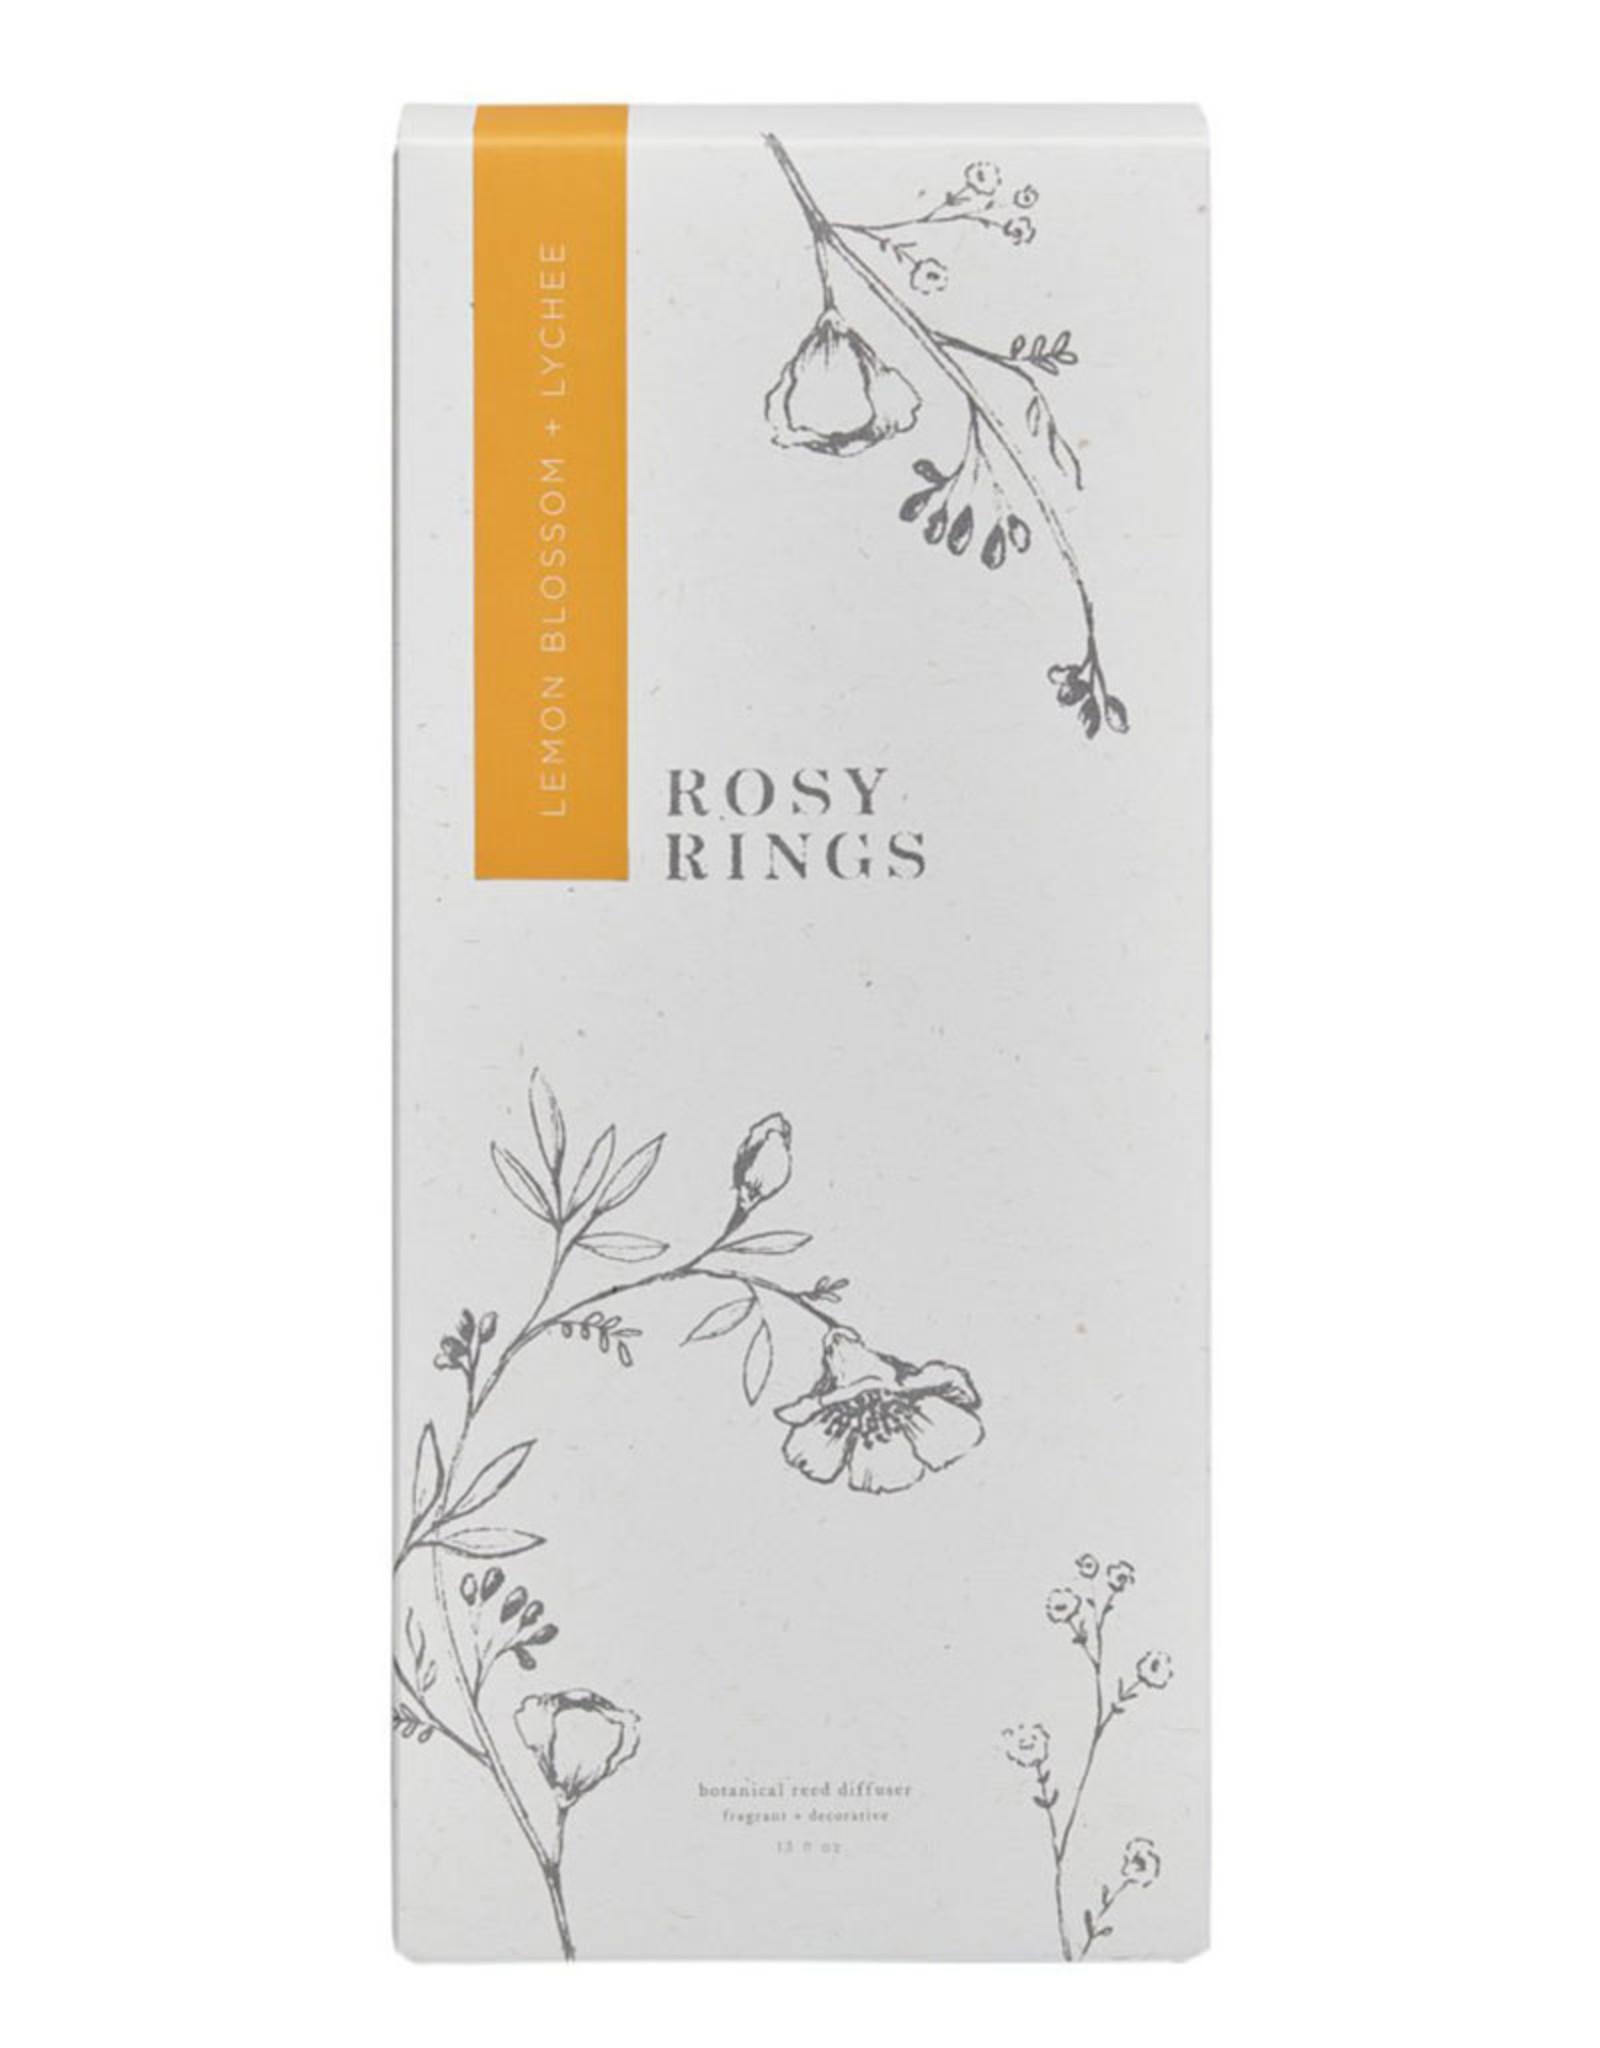 ROSY RINGS LEMON BLOSSOM & LYCHEE BOTANICAL DIFFUSER